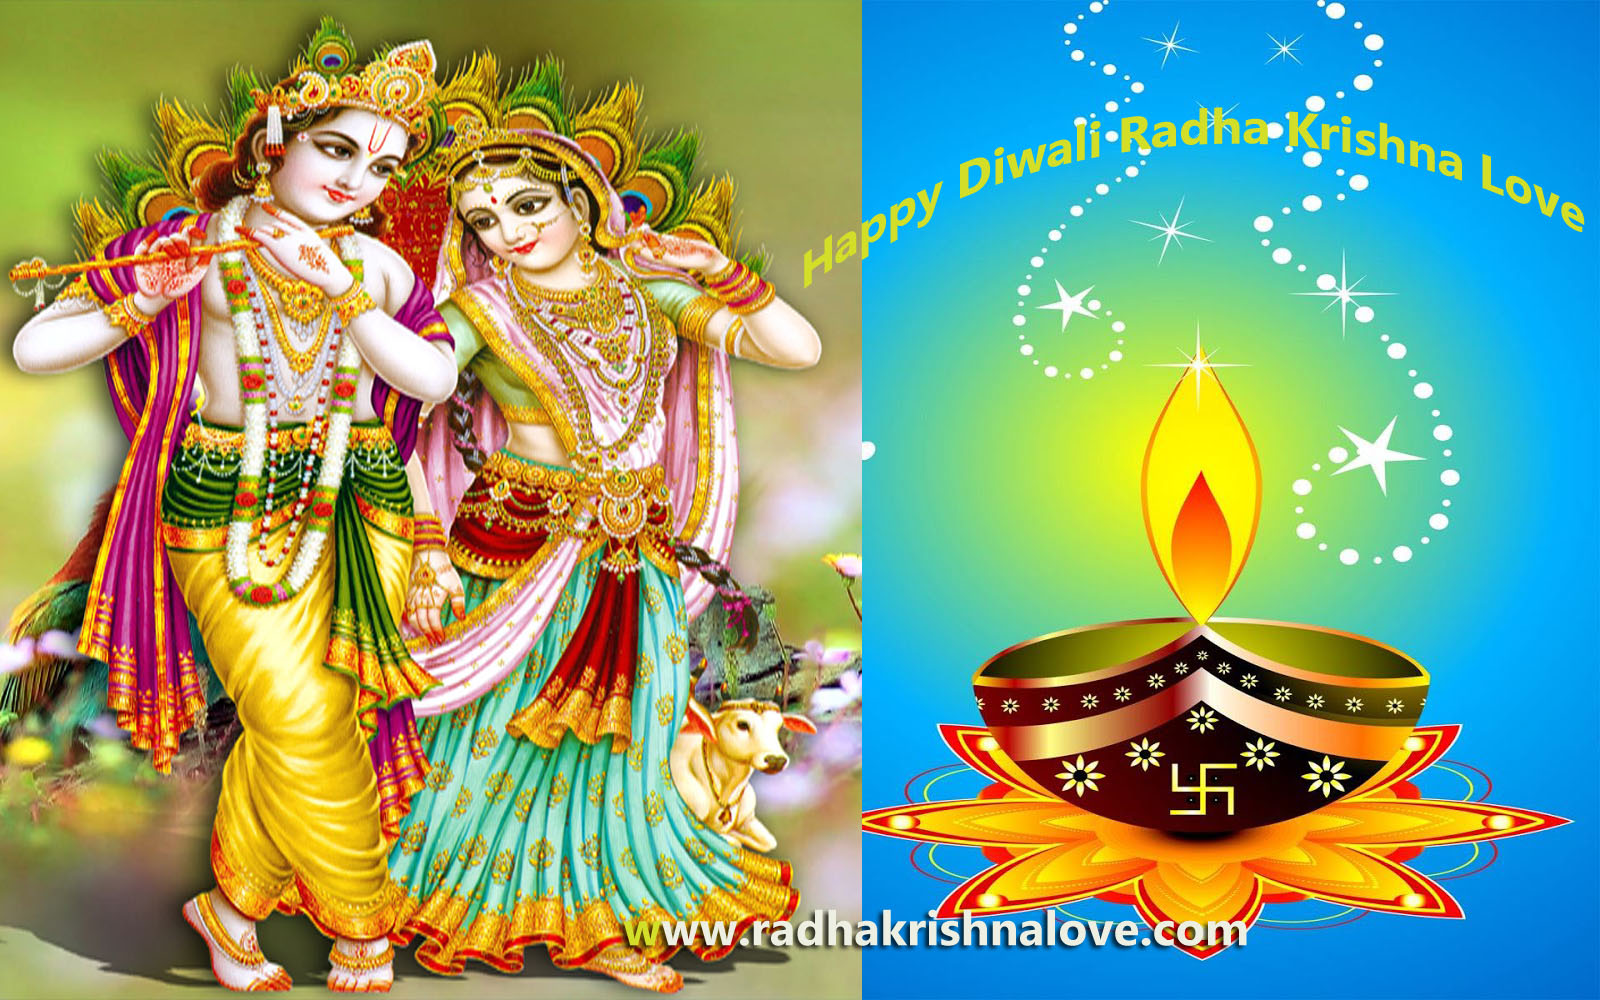 Radha Krishna Diwali Images HD